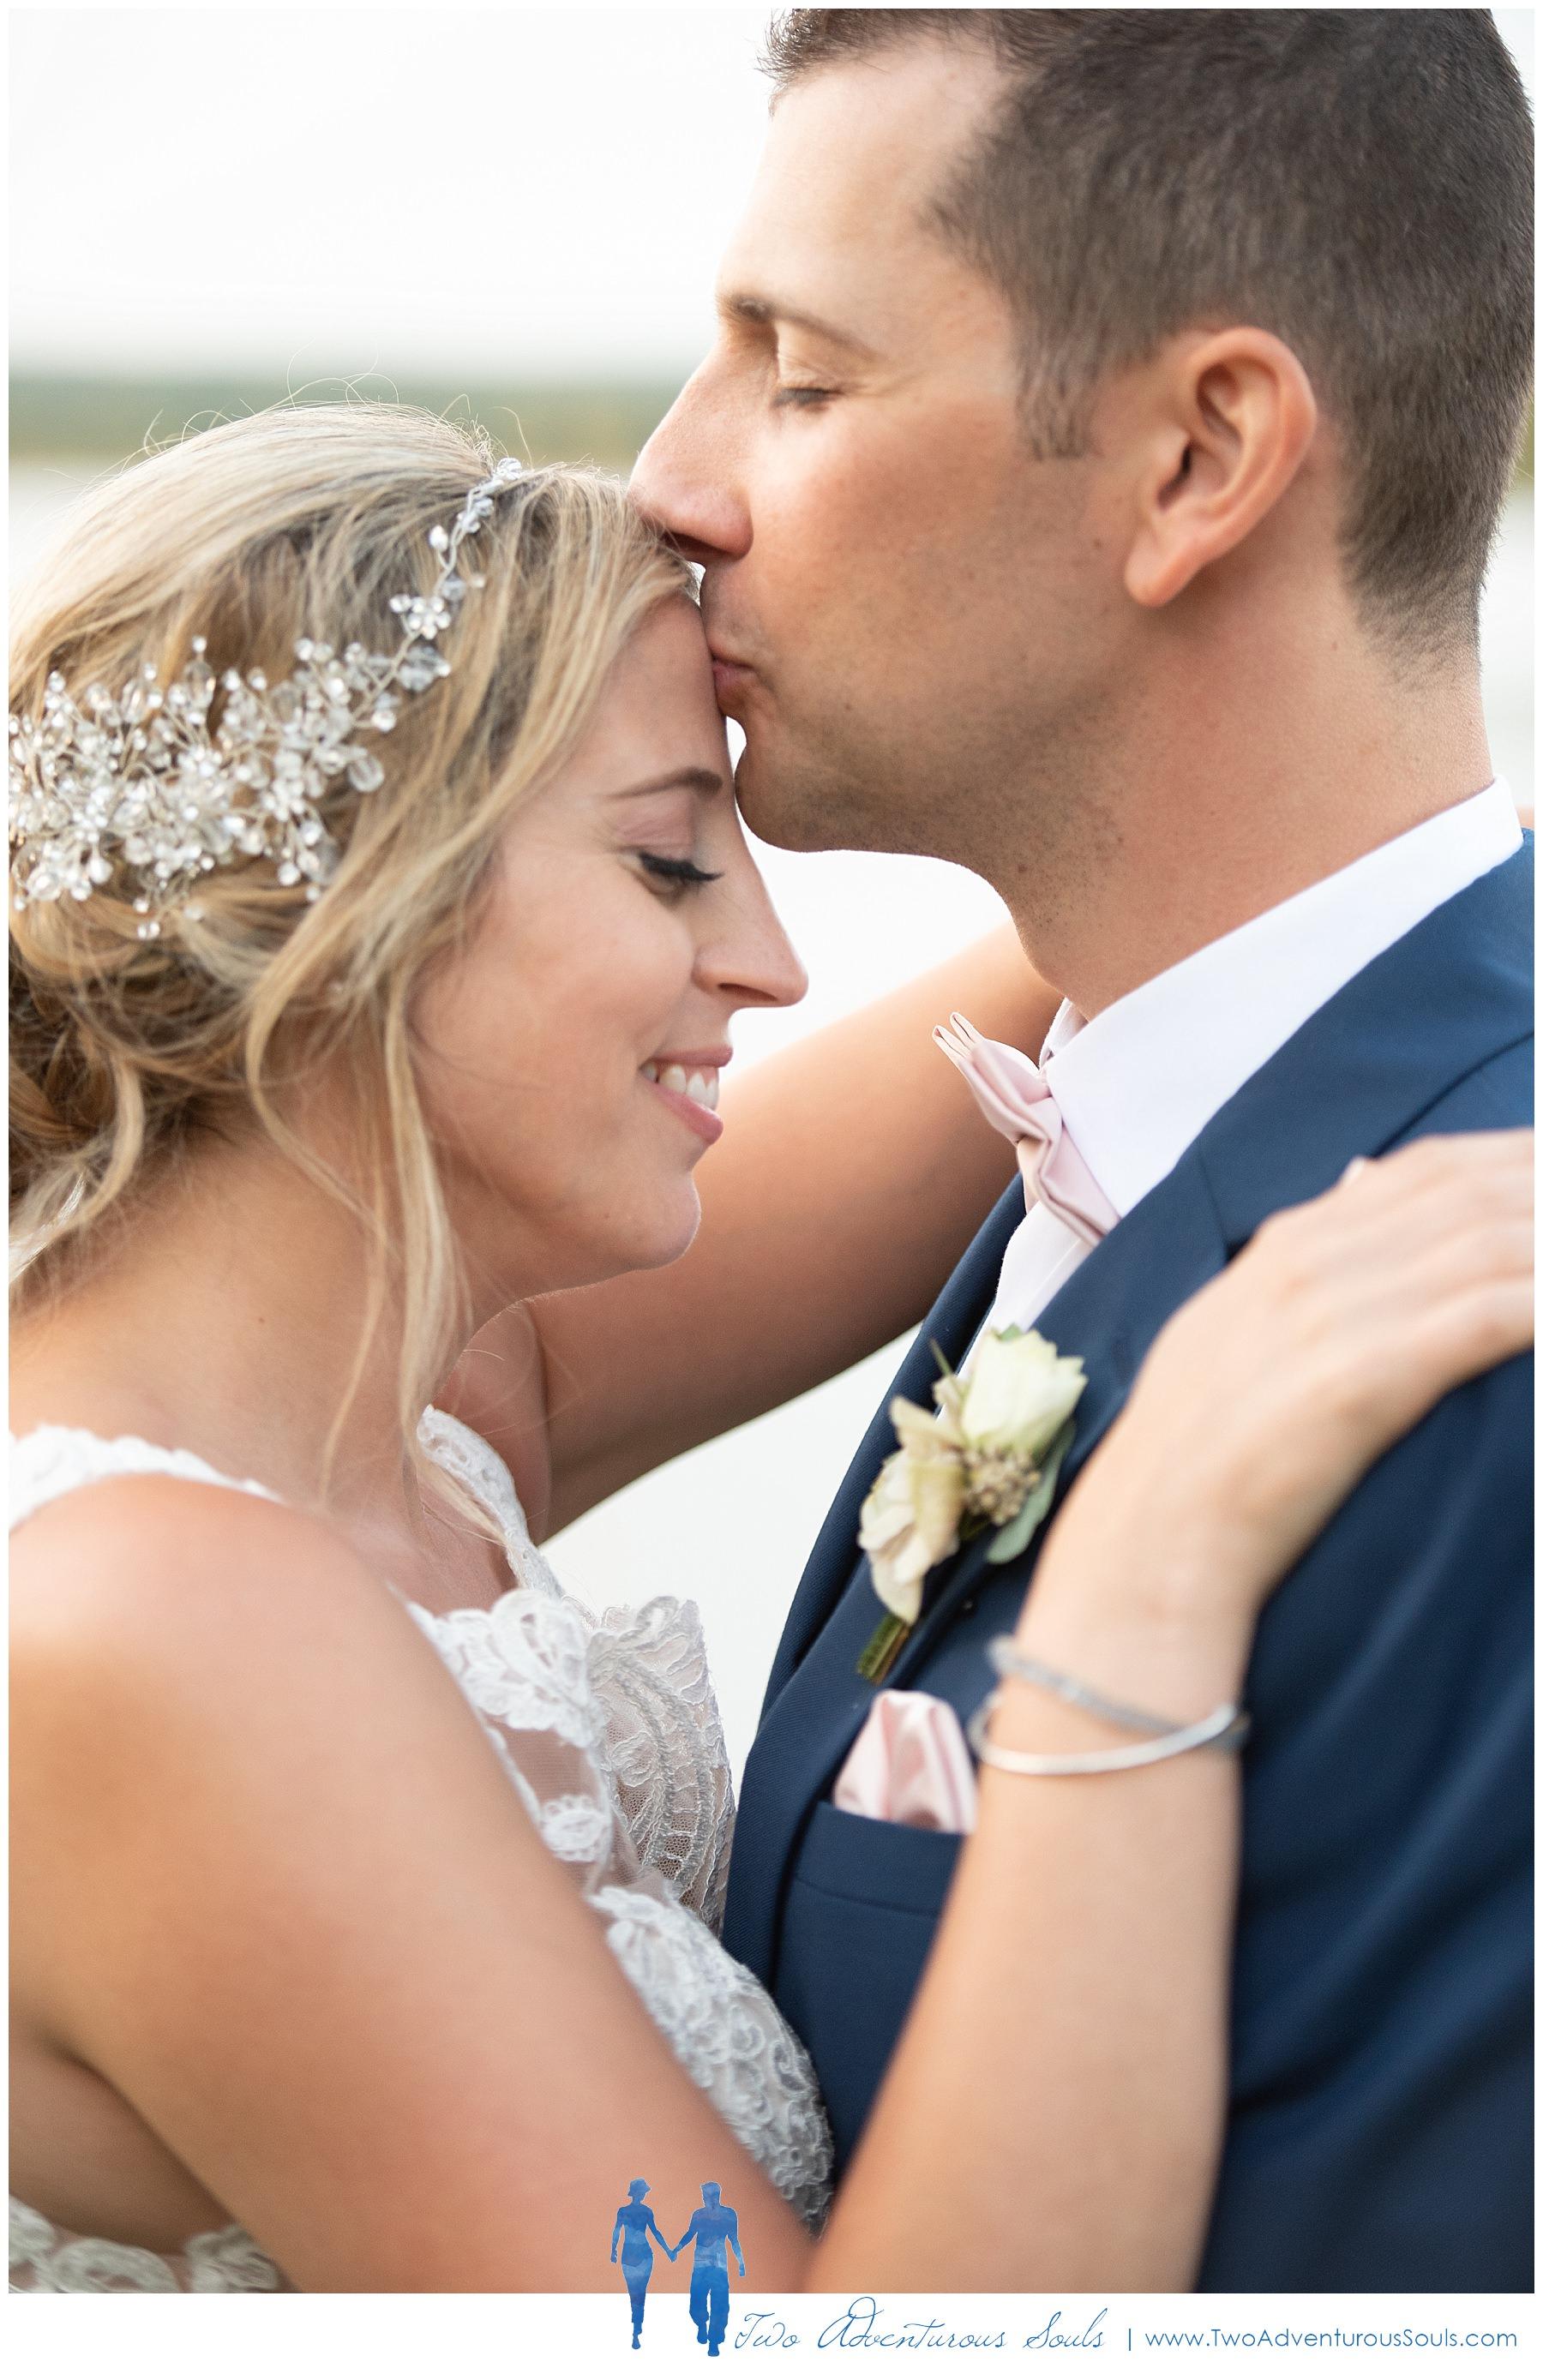 Connecticut Wedding Photographers, Lace Factory Wedding Photographers, Two Adventurous Souls - 083119_0045.jpg